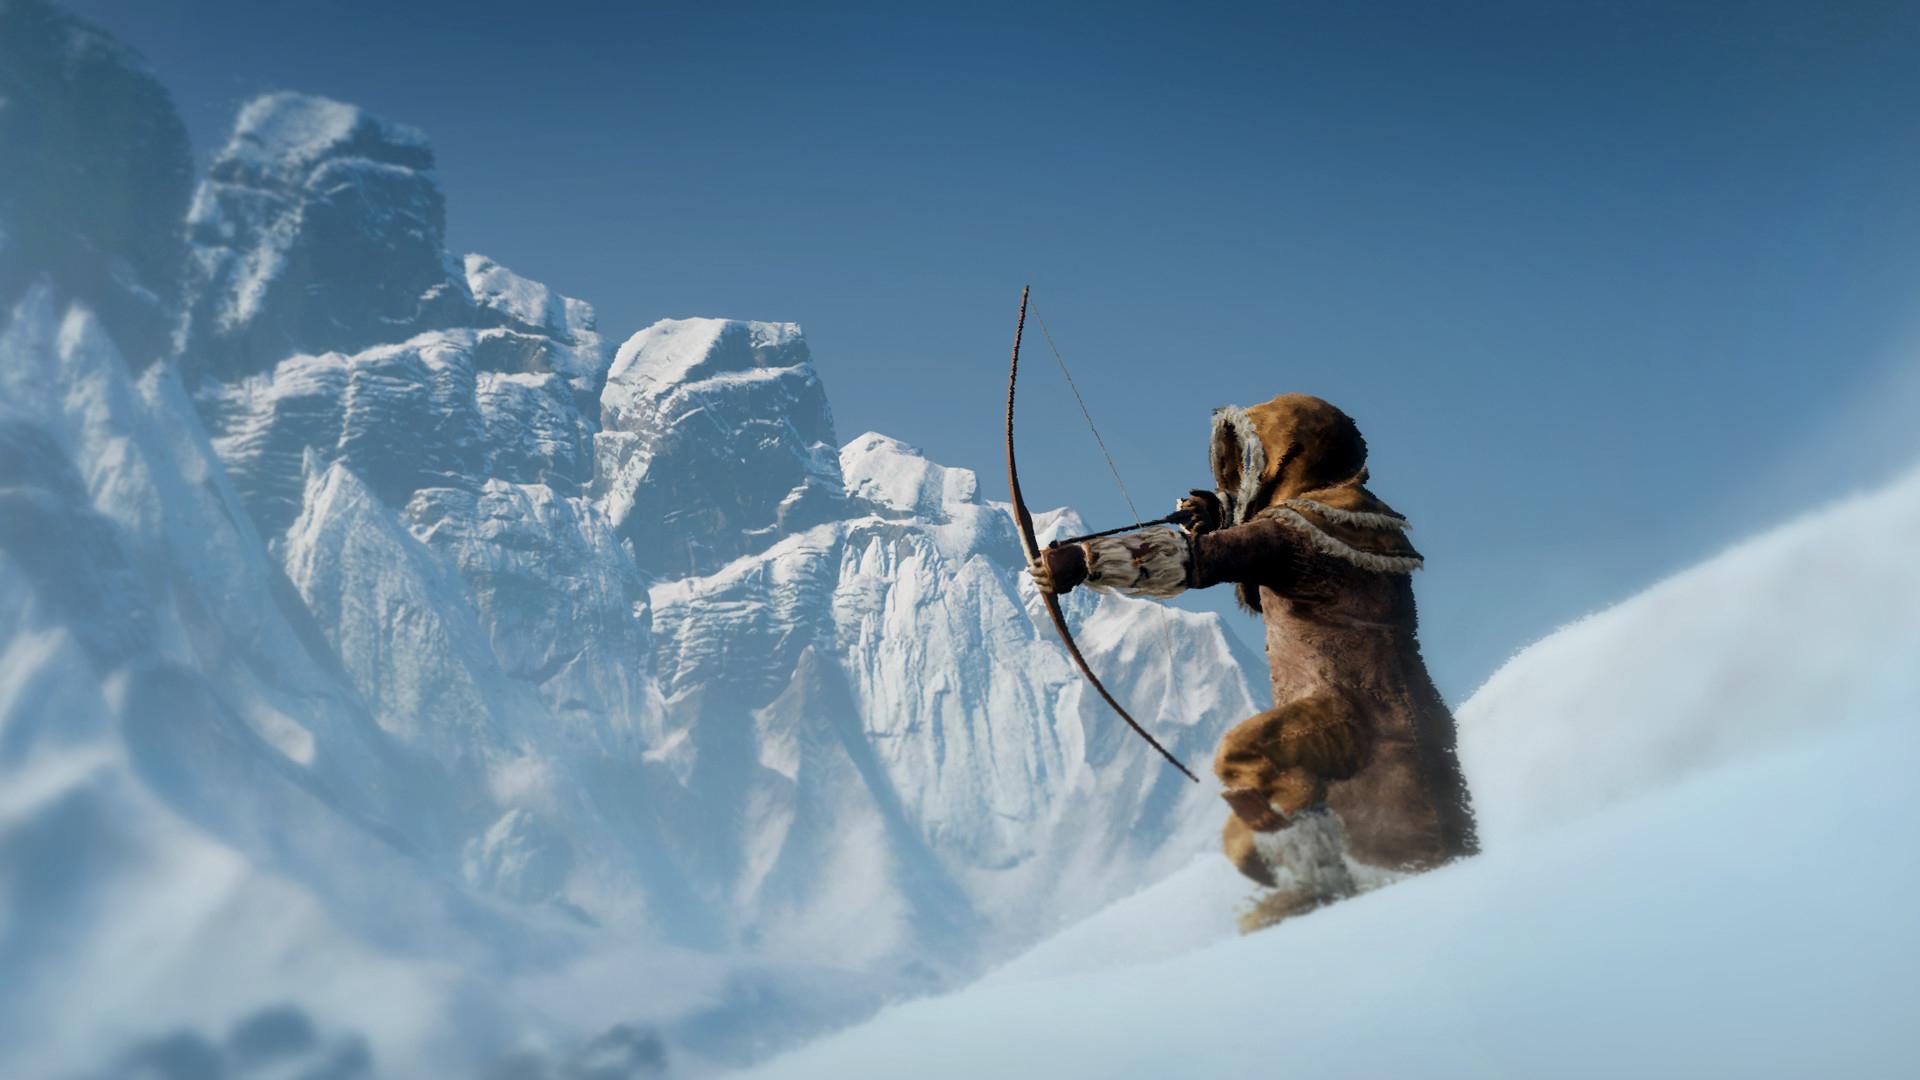 icarus arctic hunting